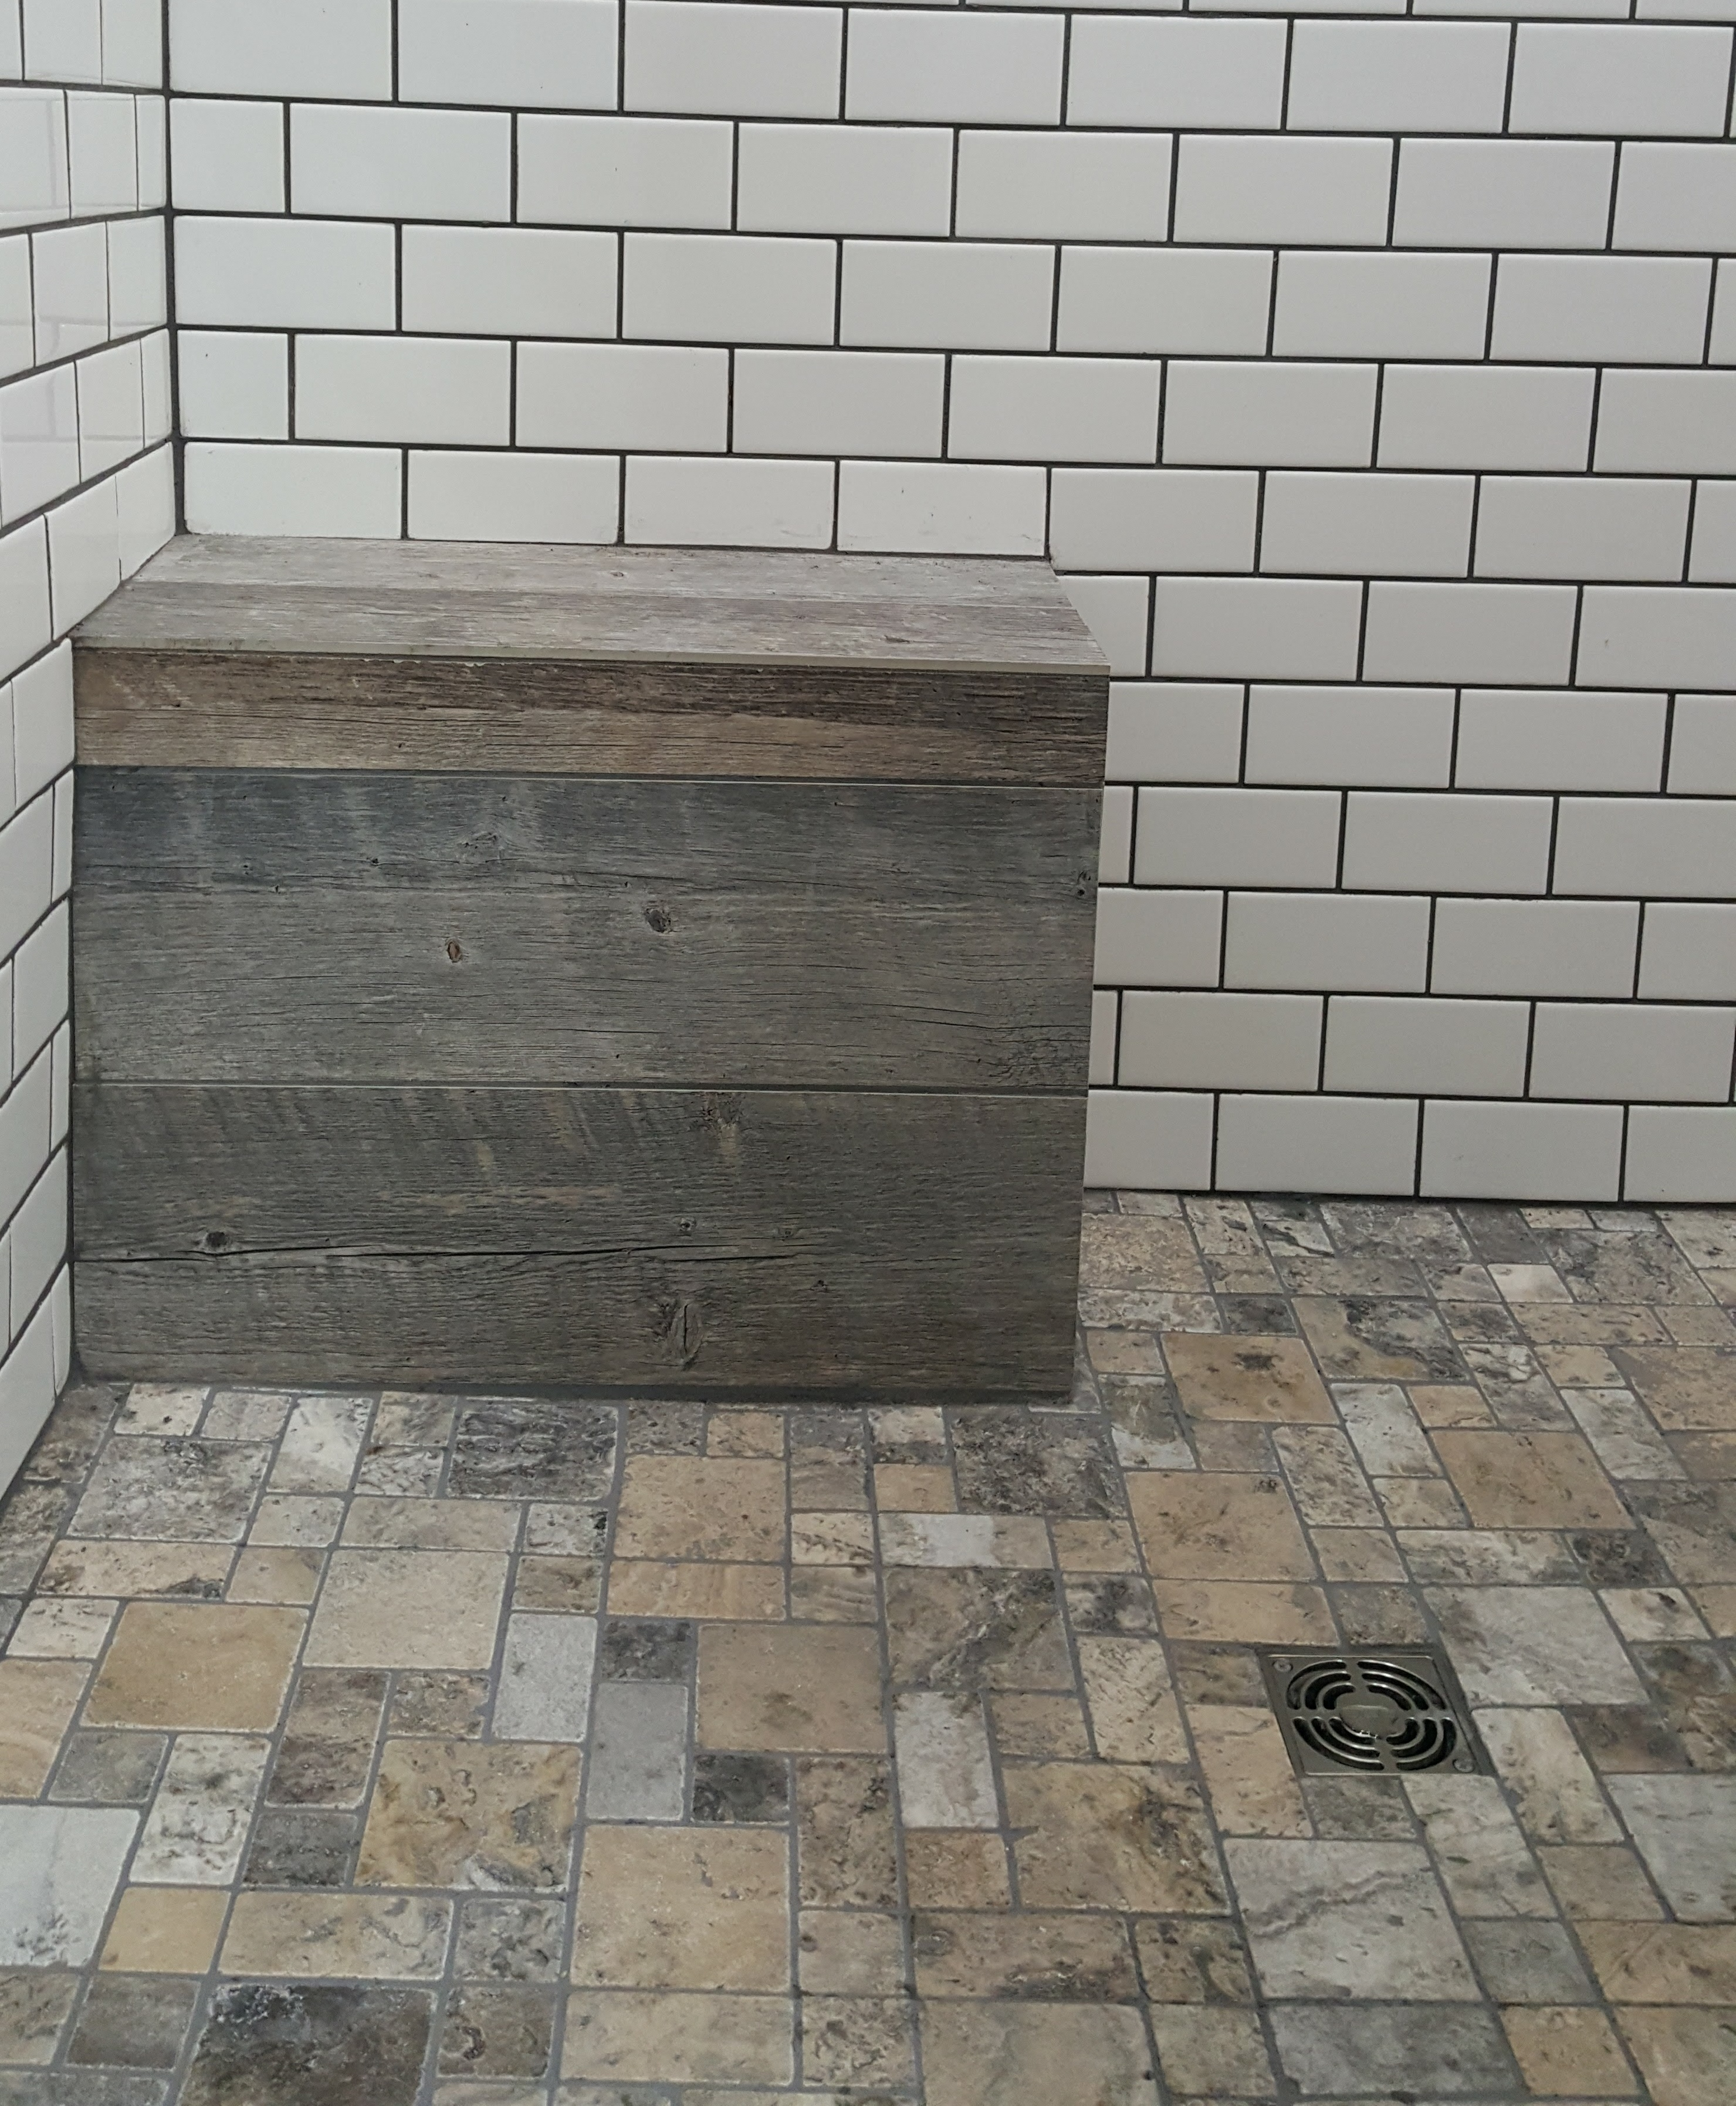 Large Subway Tiles Bathroom: Large Subway Tile Bathroom